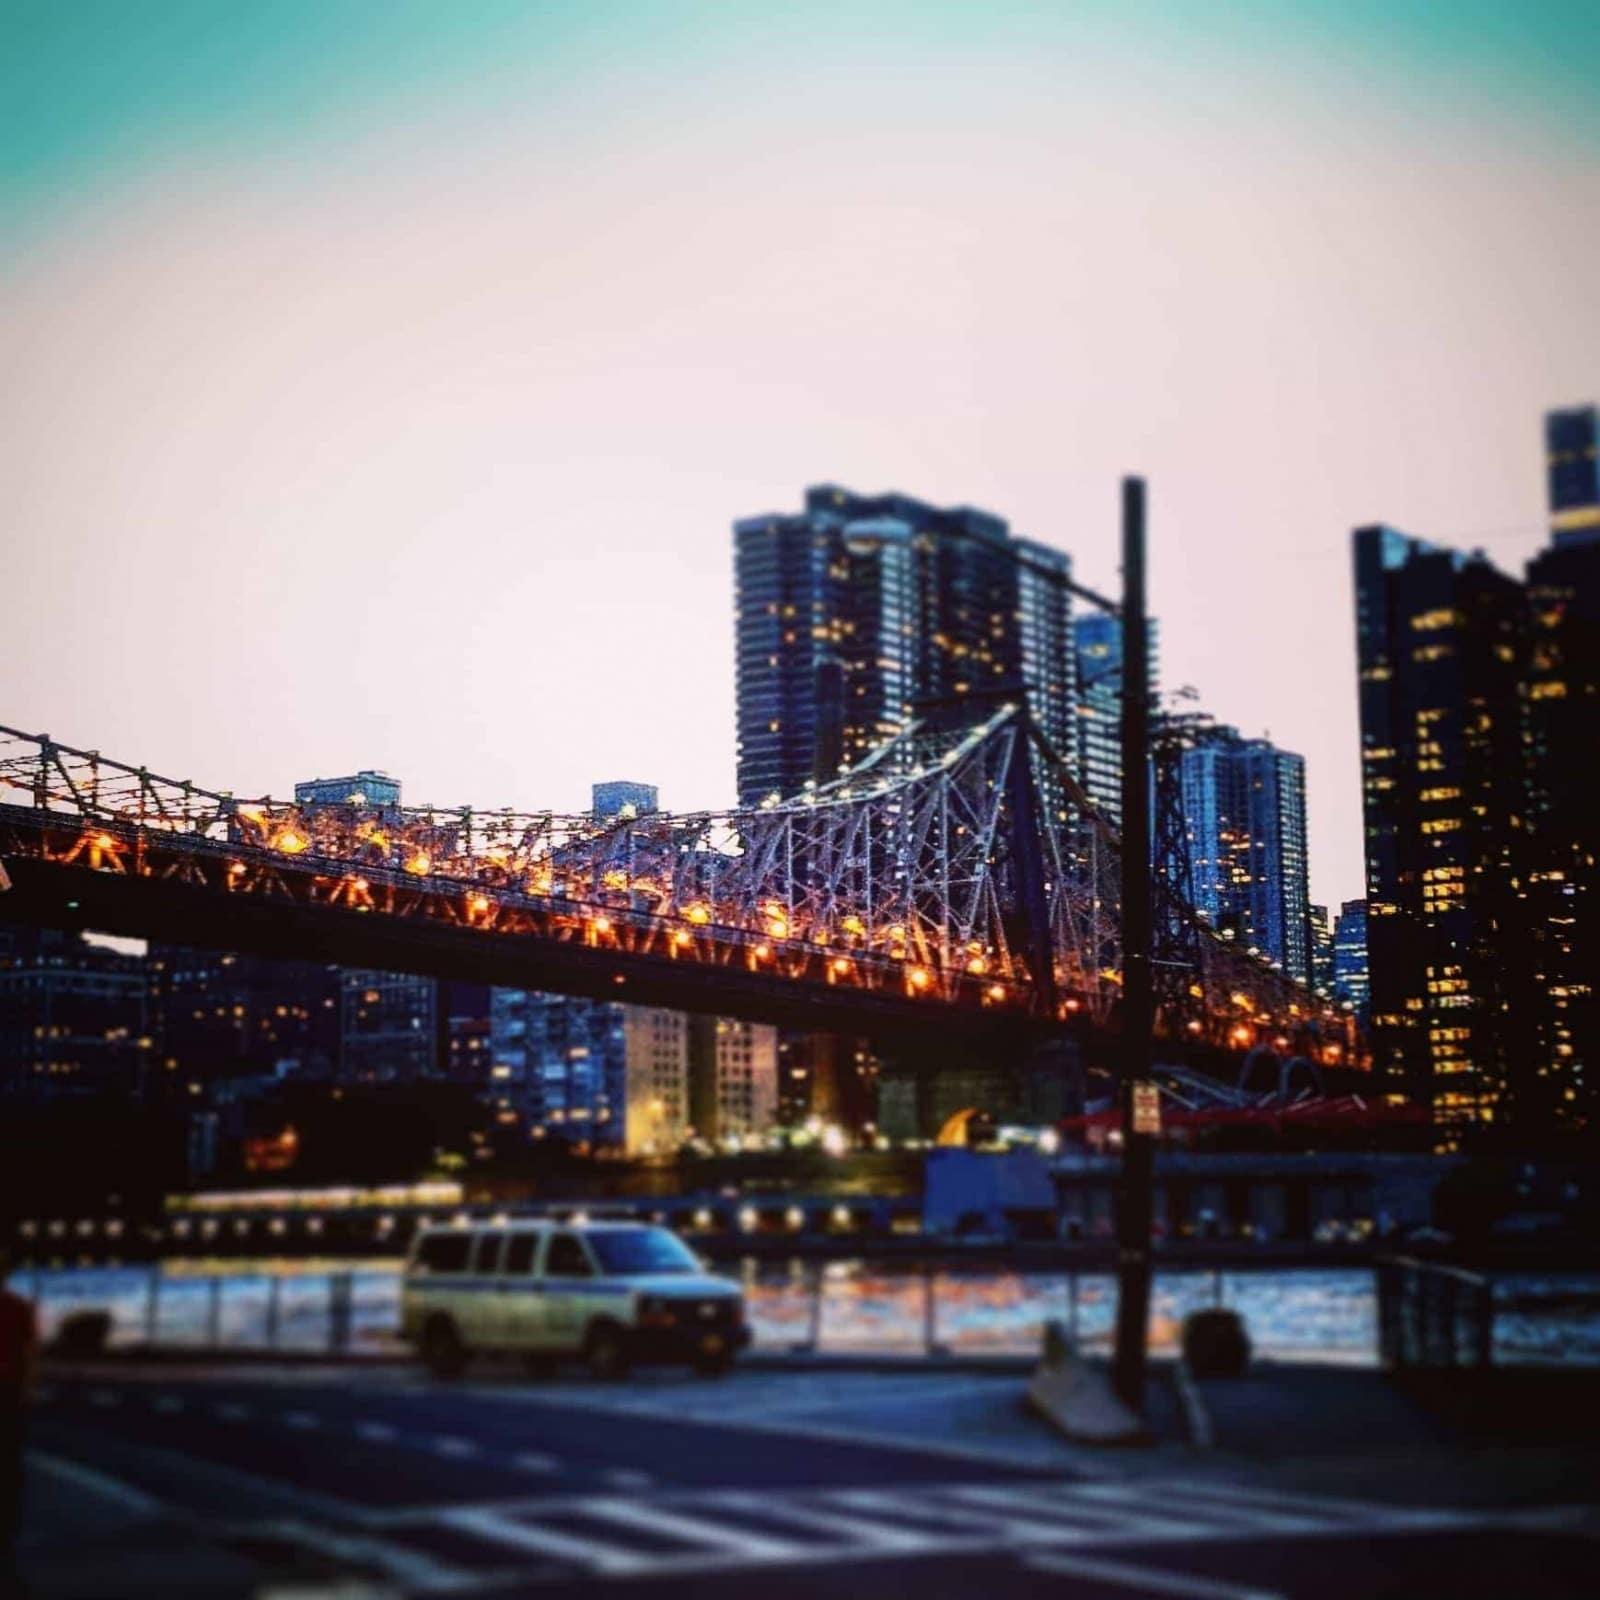 New York: a Bridge (photo by Ruthanne Reid)